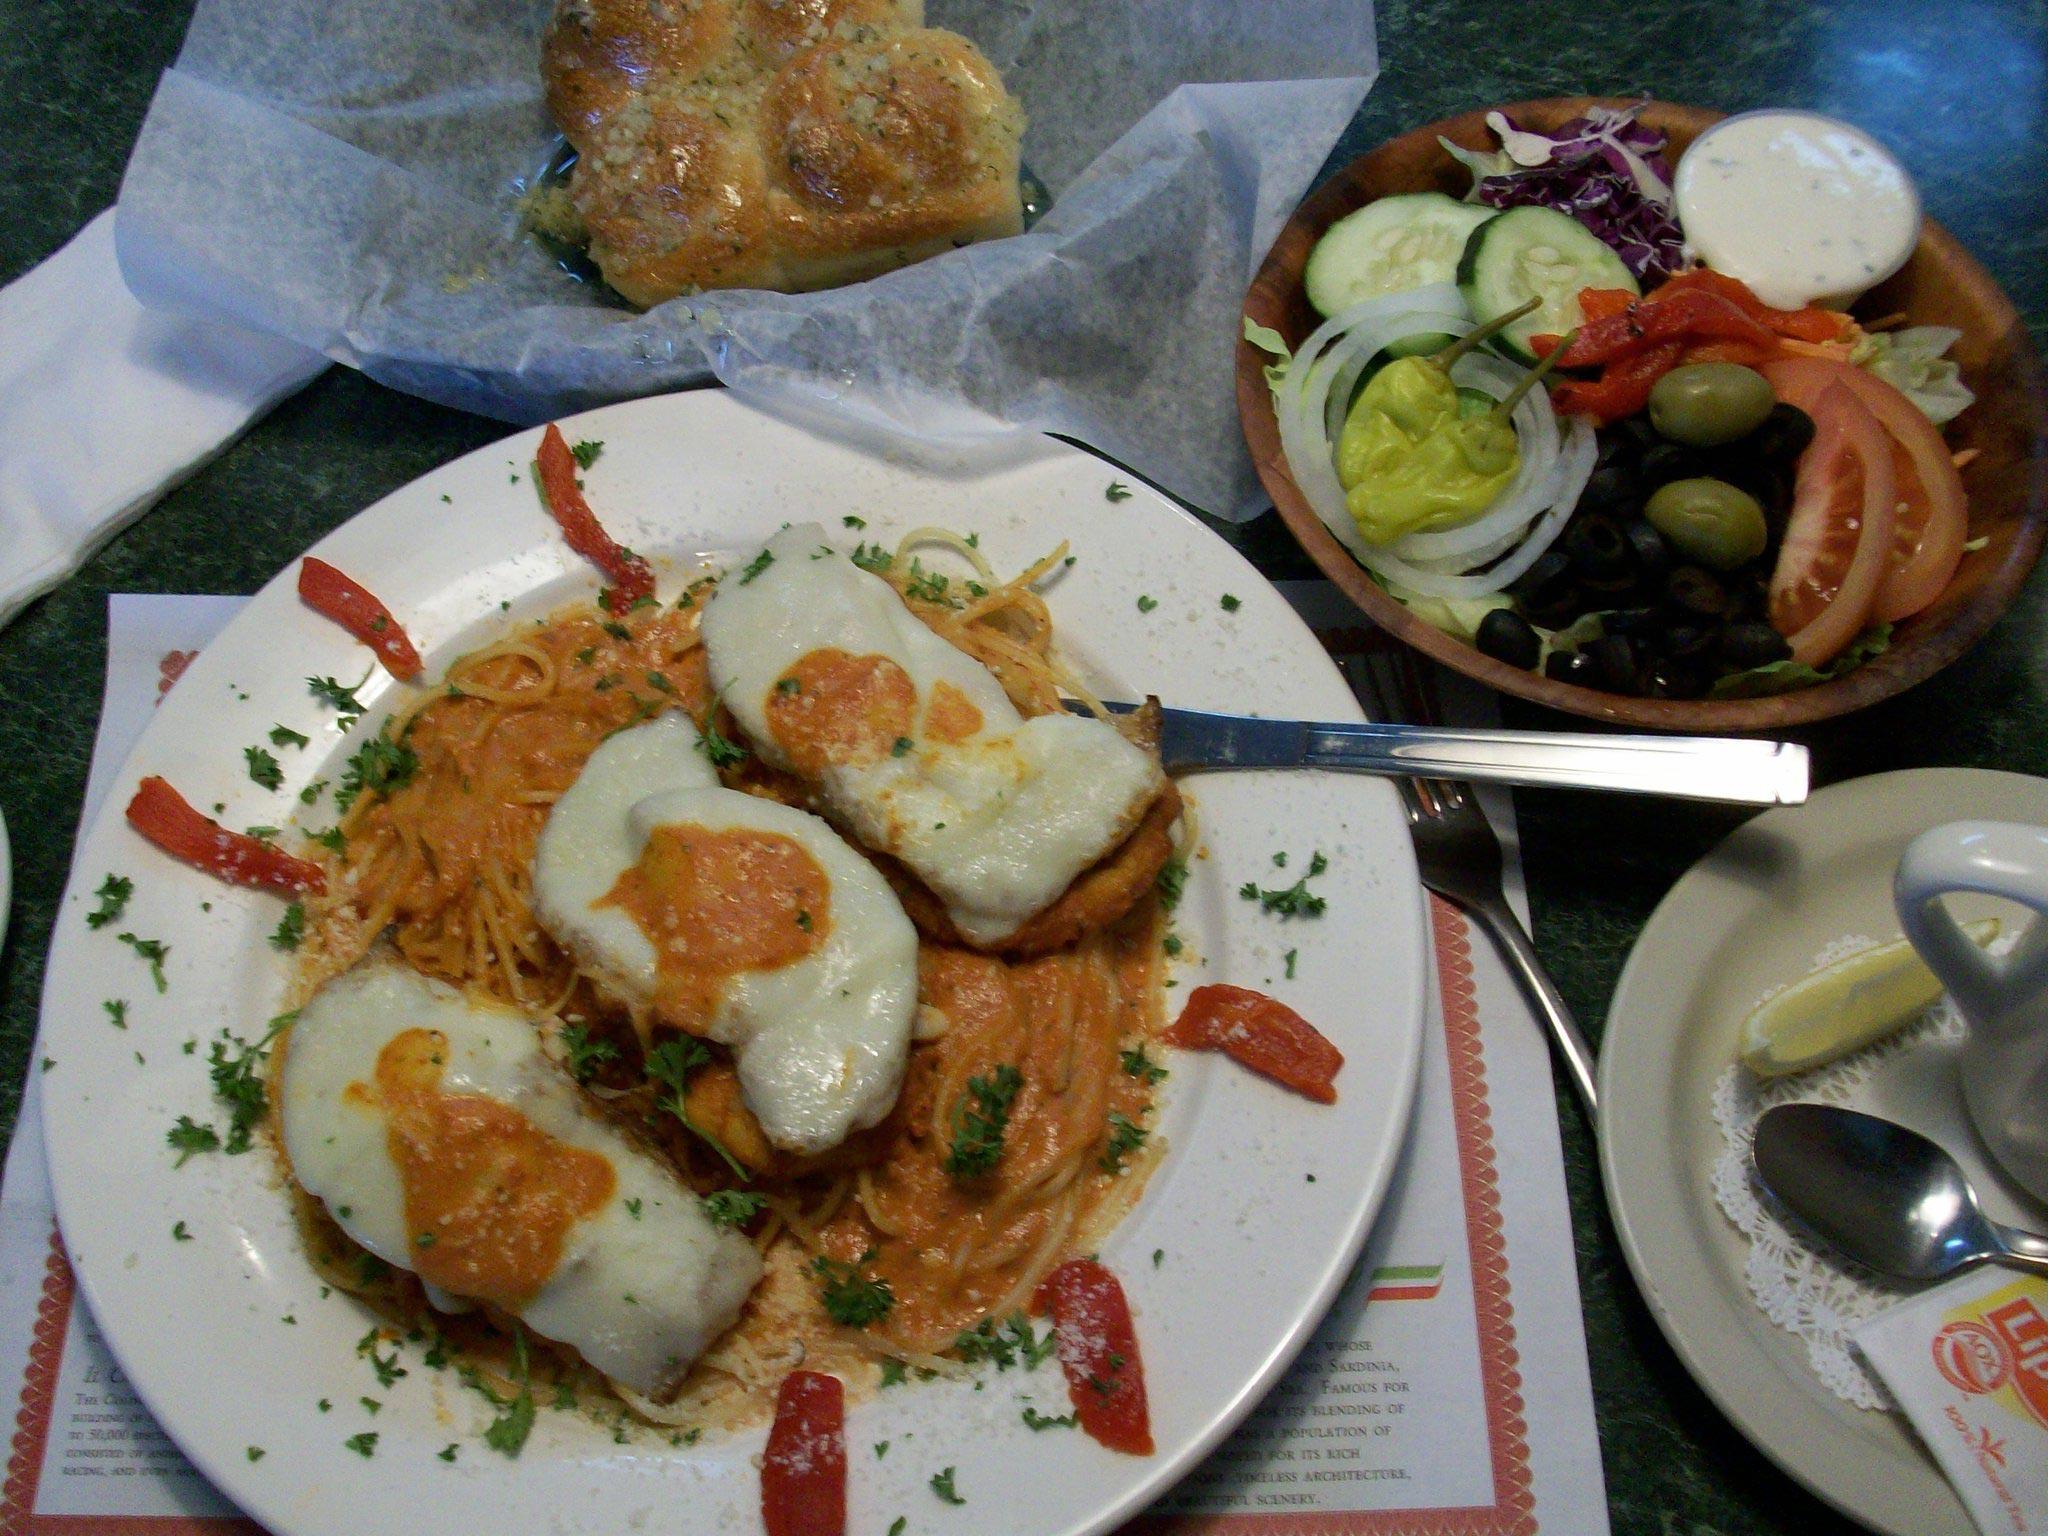 DISALVO'S PIZZA & ITALIAN RESTAURANT & DINNING